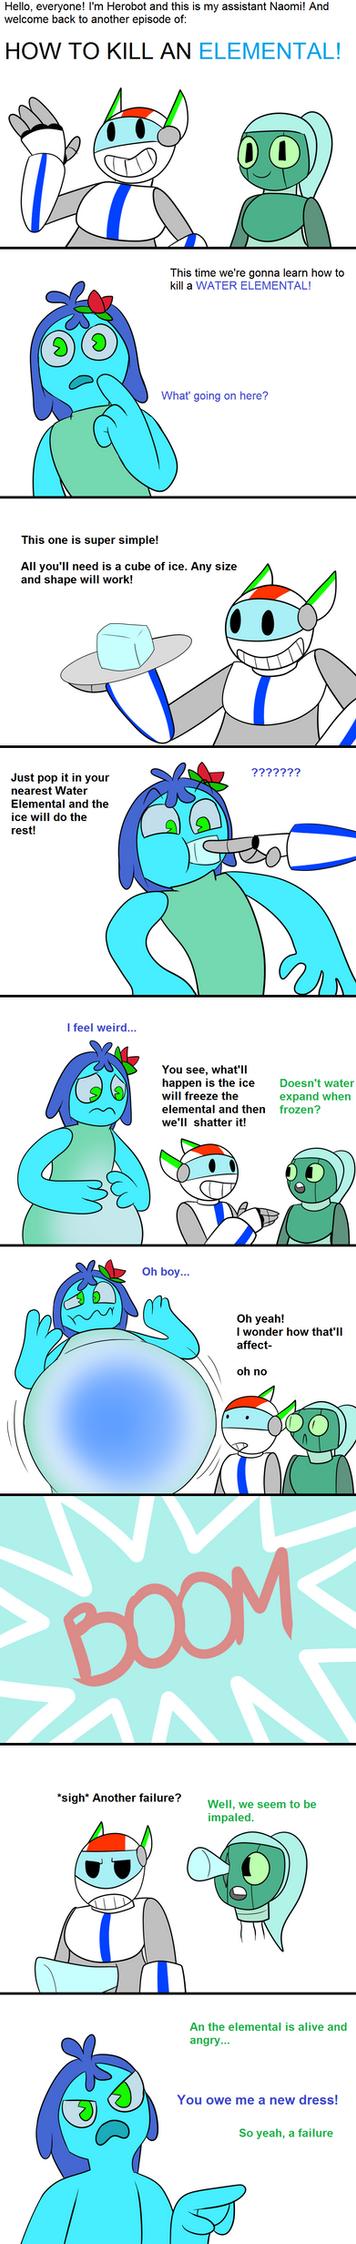 How to Kill an Elemental: Aqua by awesomesir